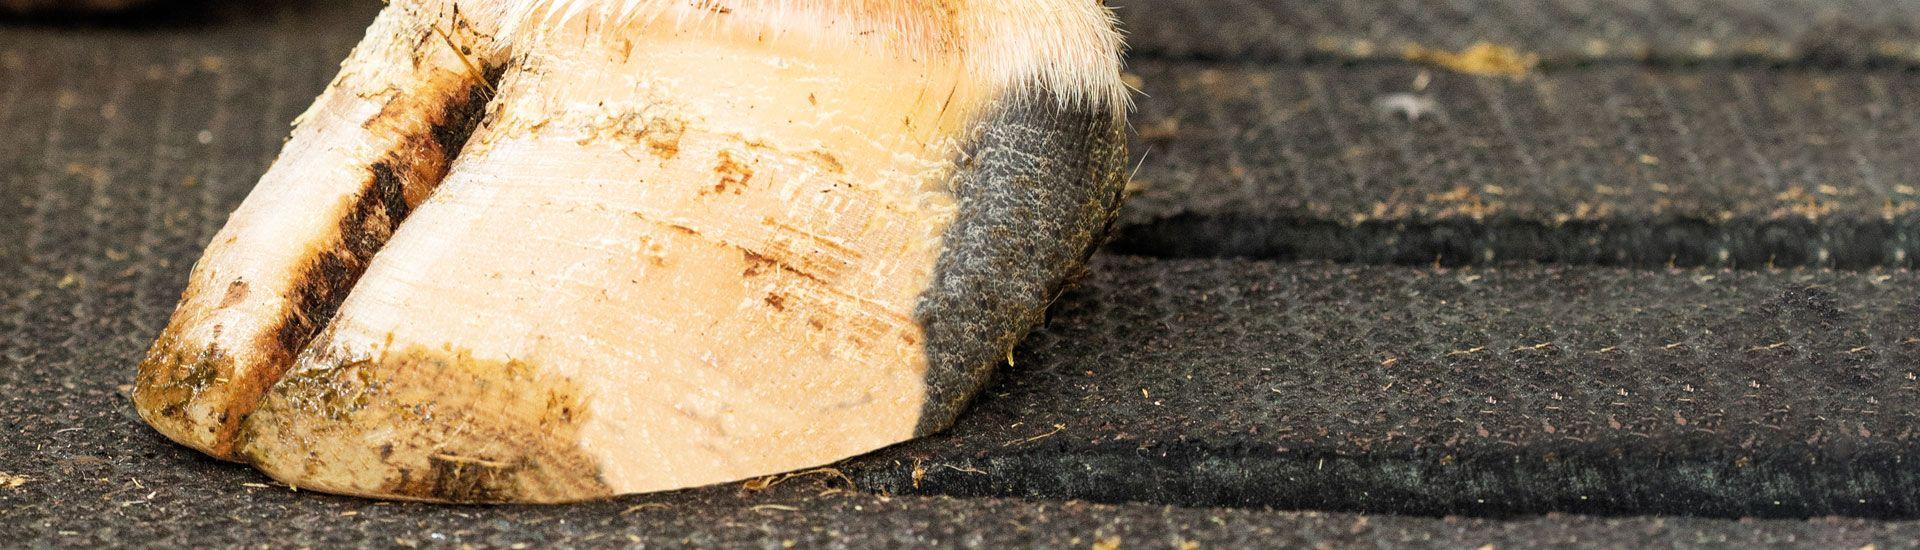 KRAIBURG rubber mats for slatted floors in dairy cow housing